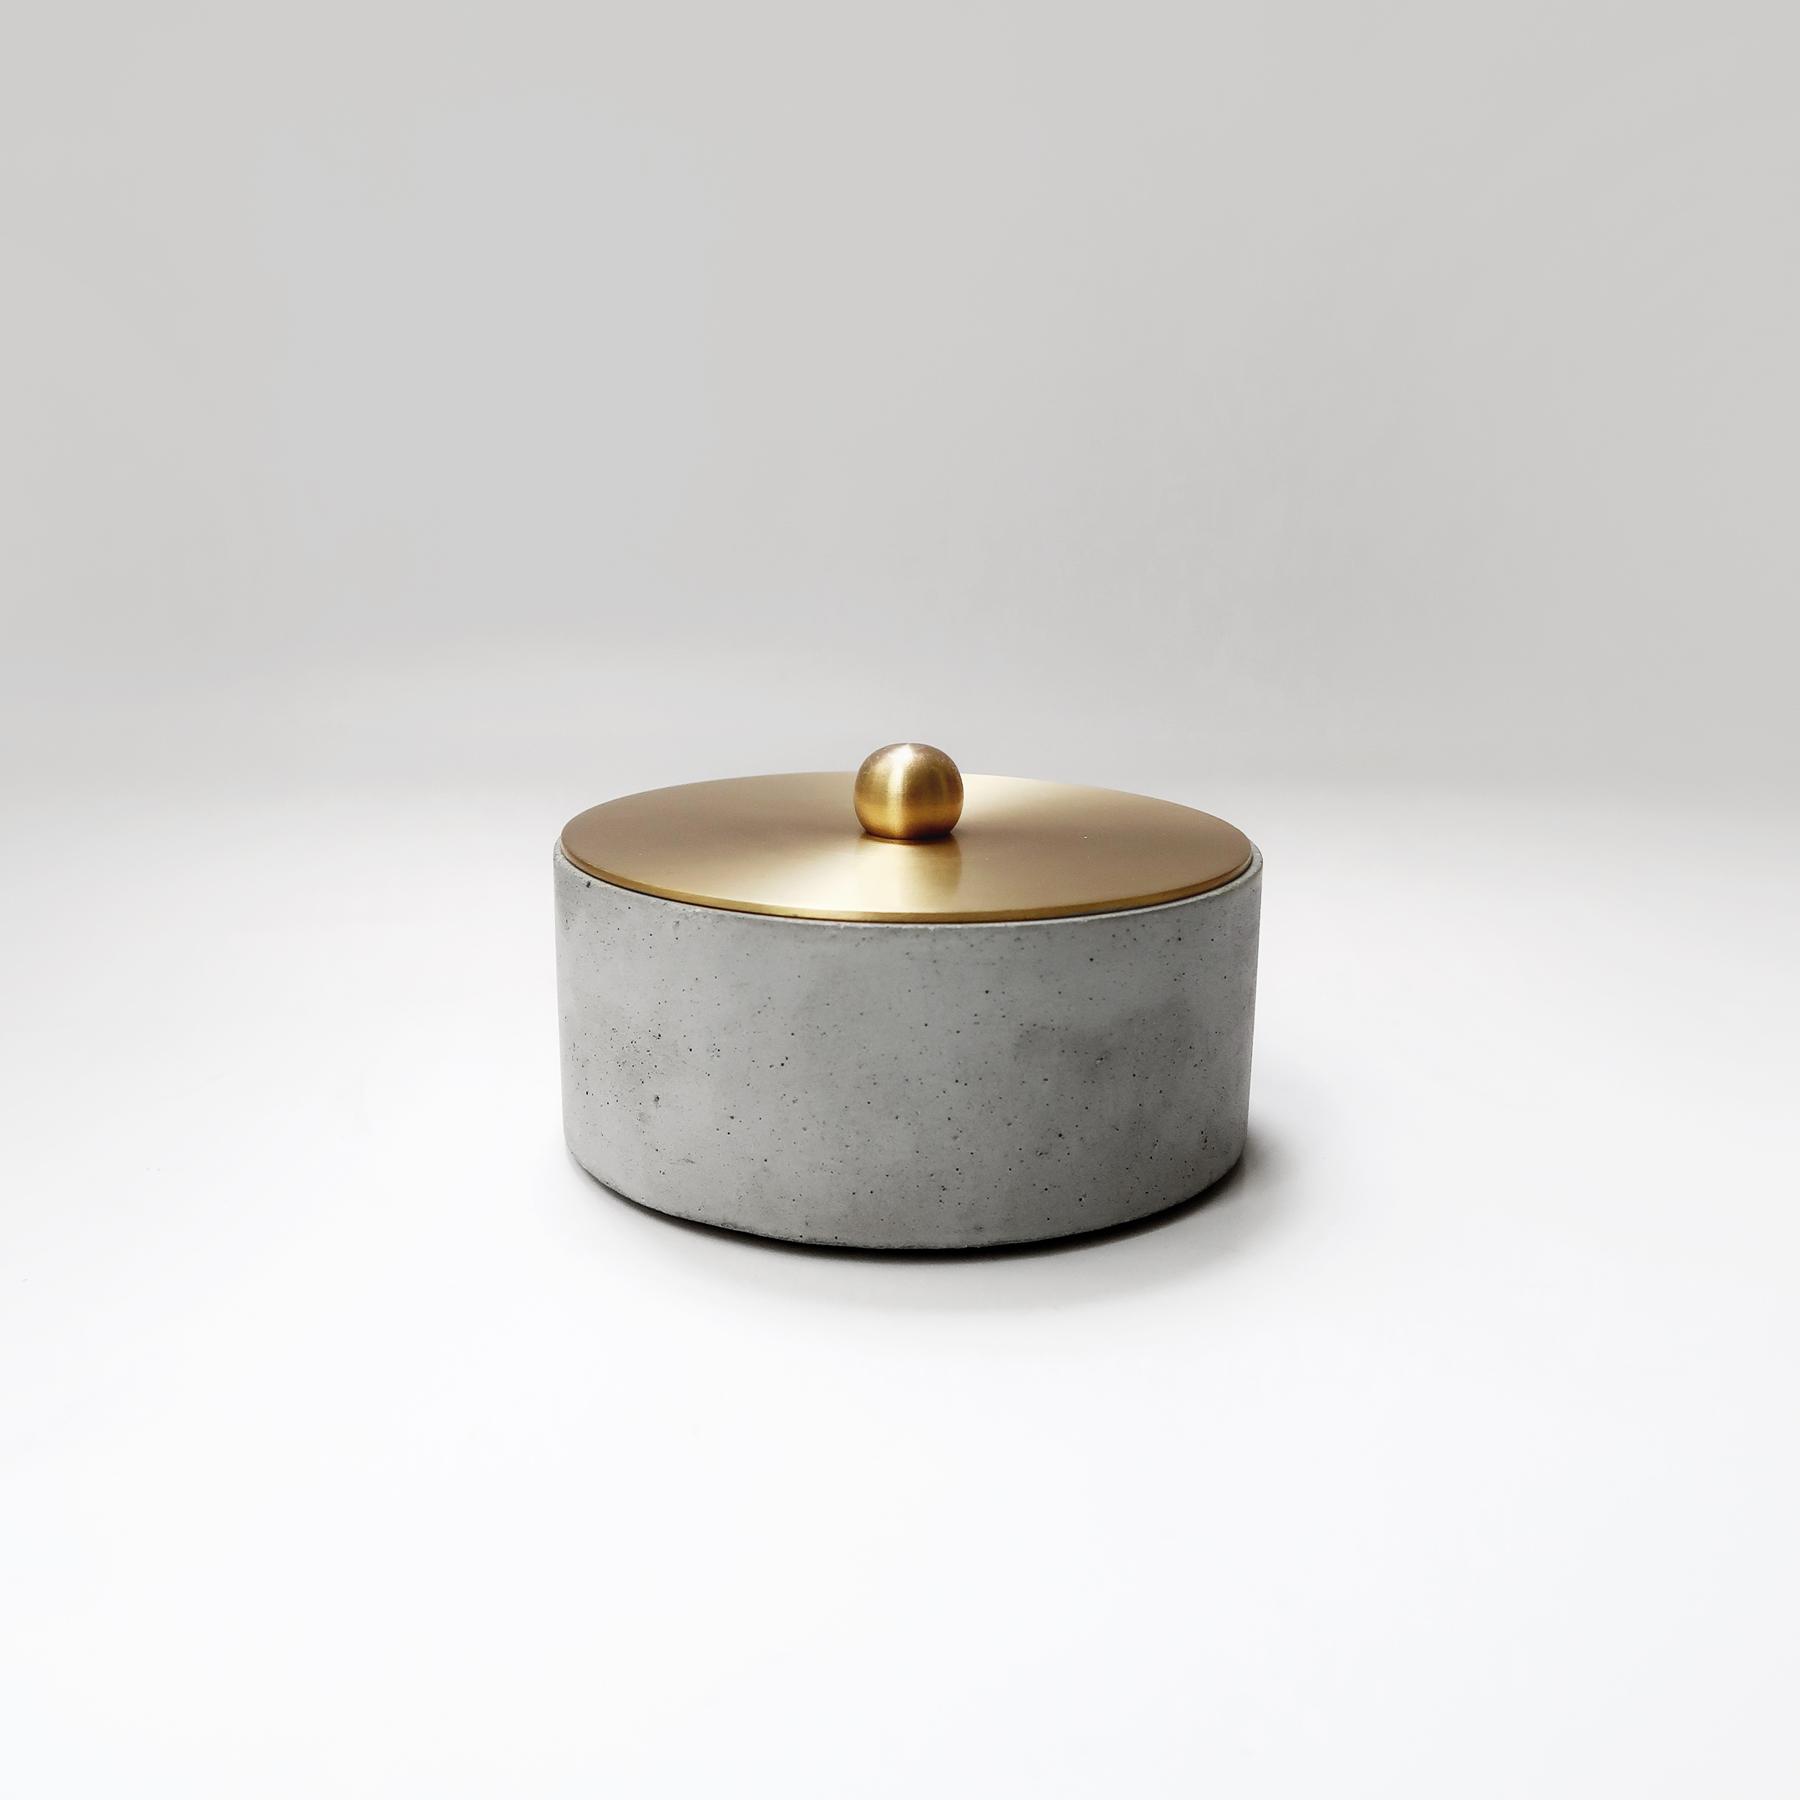 Concrete Design 圓球黃銅蓋水泥收納容器・飾品盒・煙灰缸